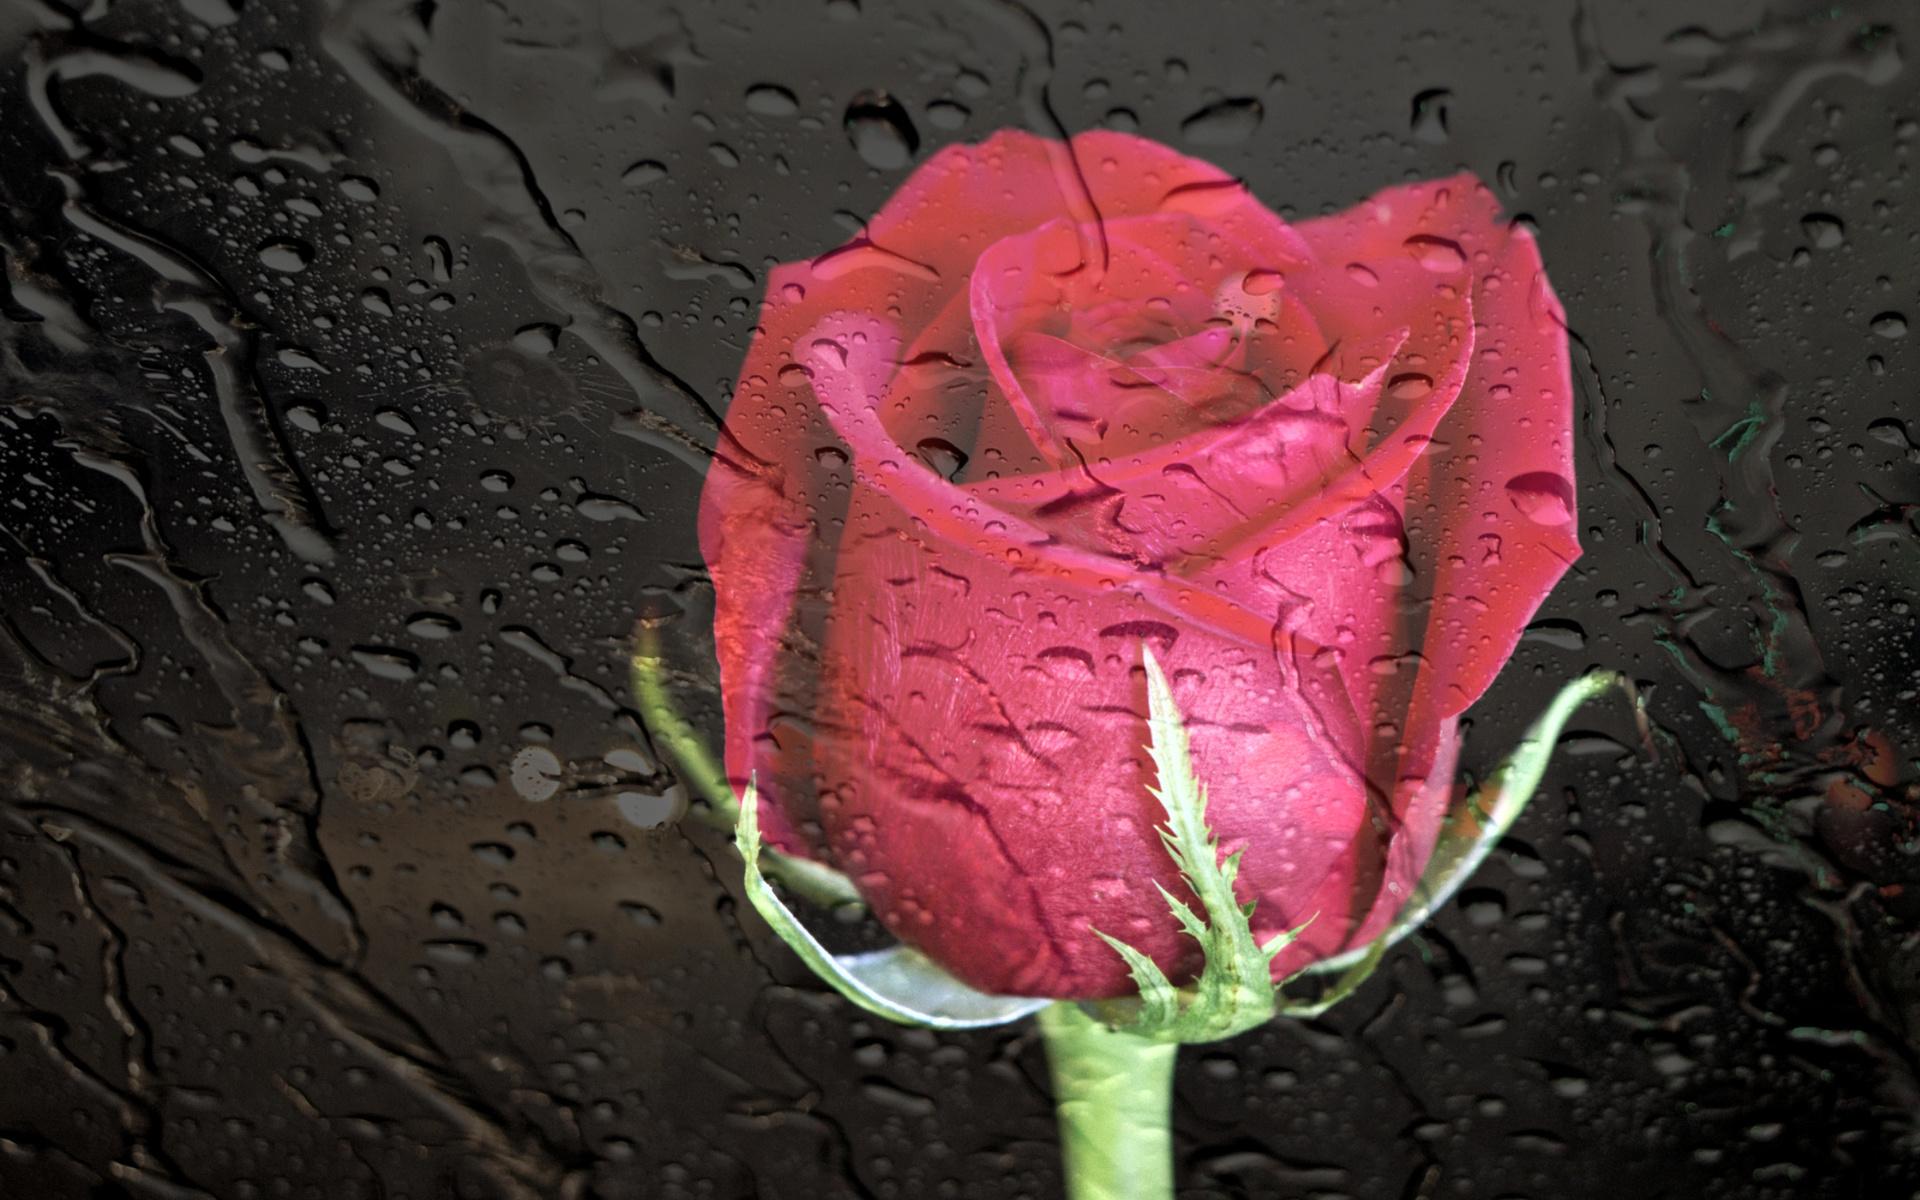 стекло, дождь, роза